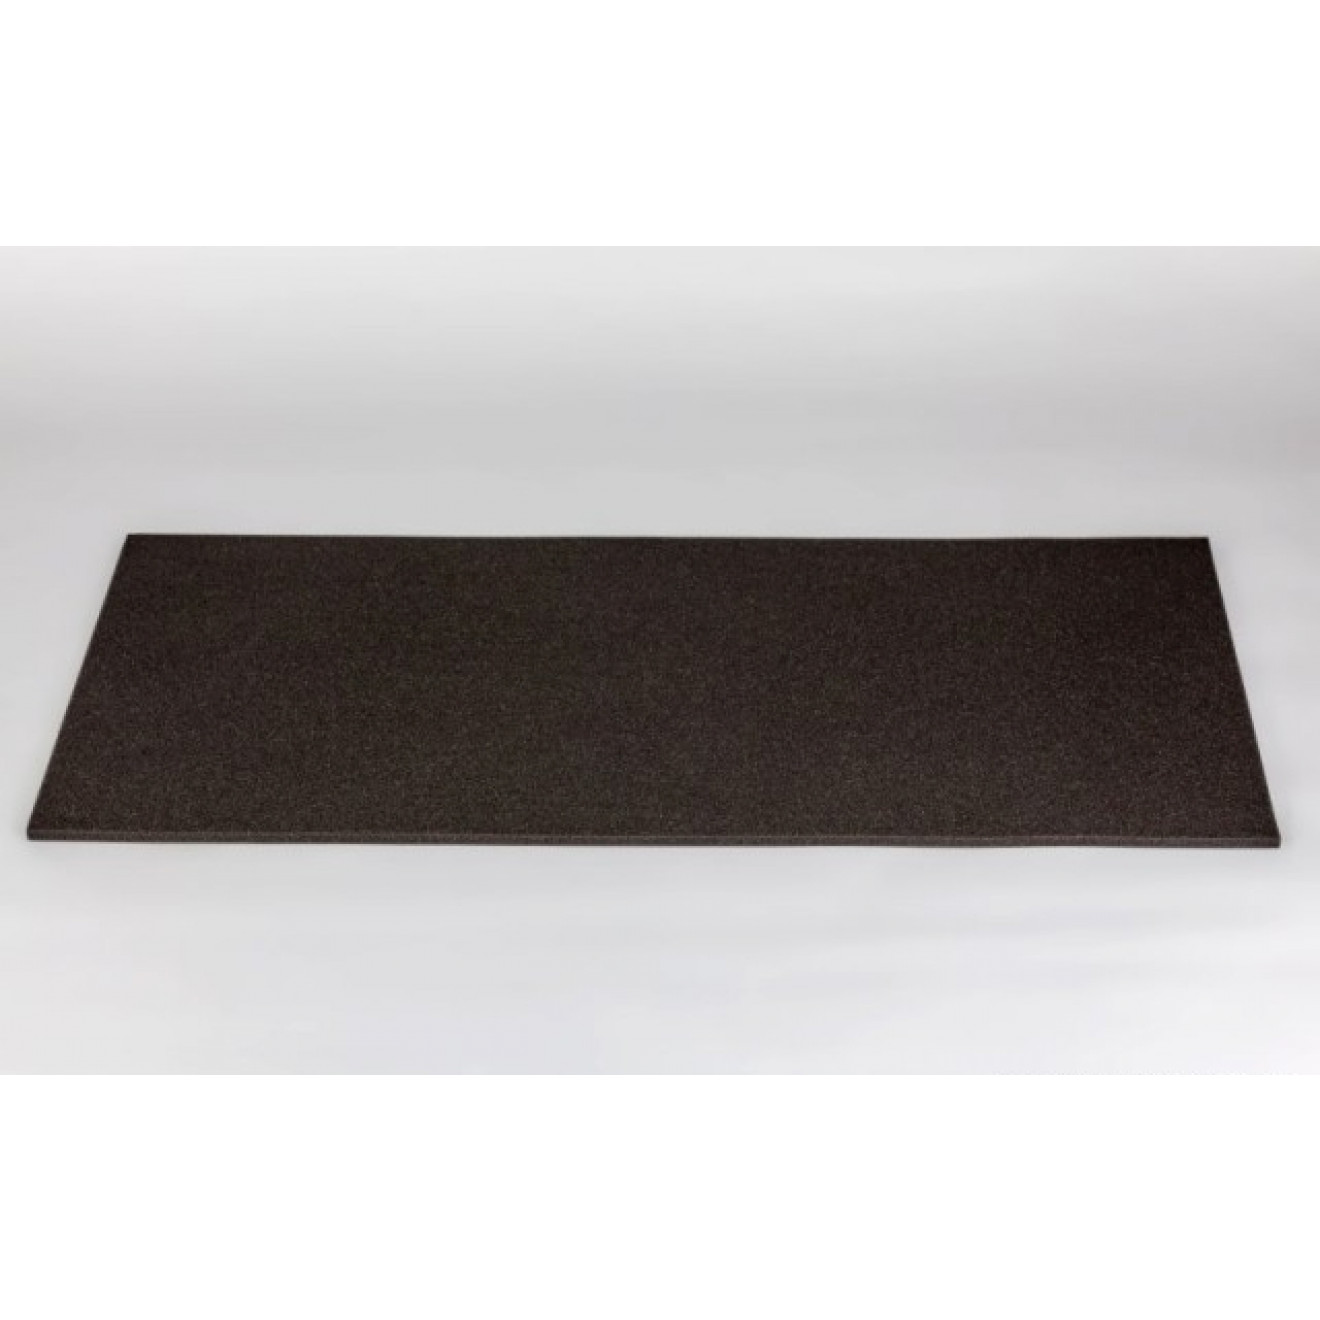 schaumstoff plan akustik 100 x 50 x 1cm anthrazit. Black Bedroom Furniture Sets. Home Design Ideas